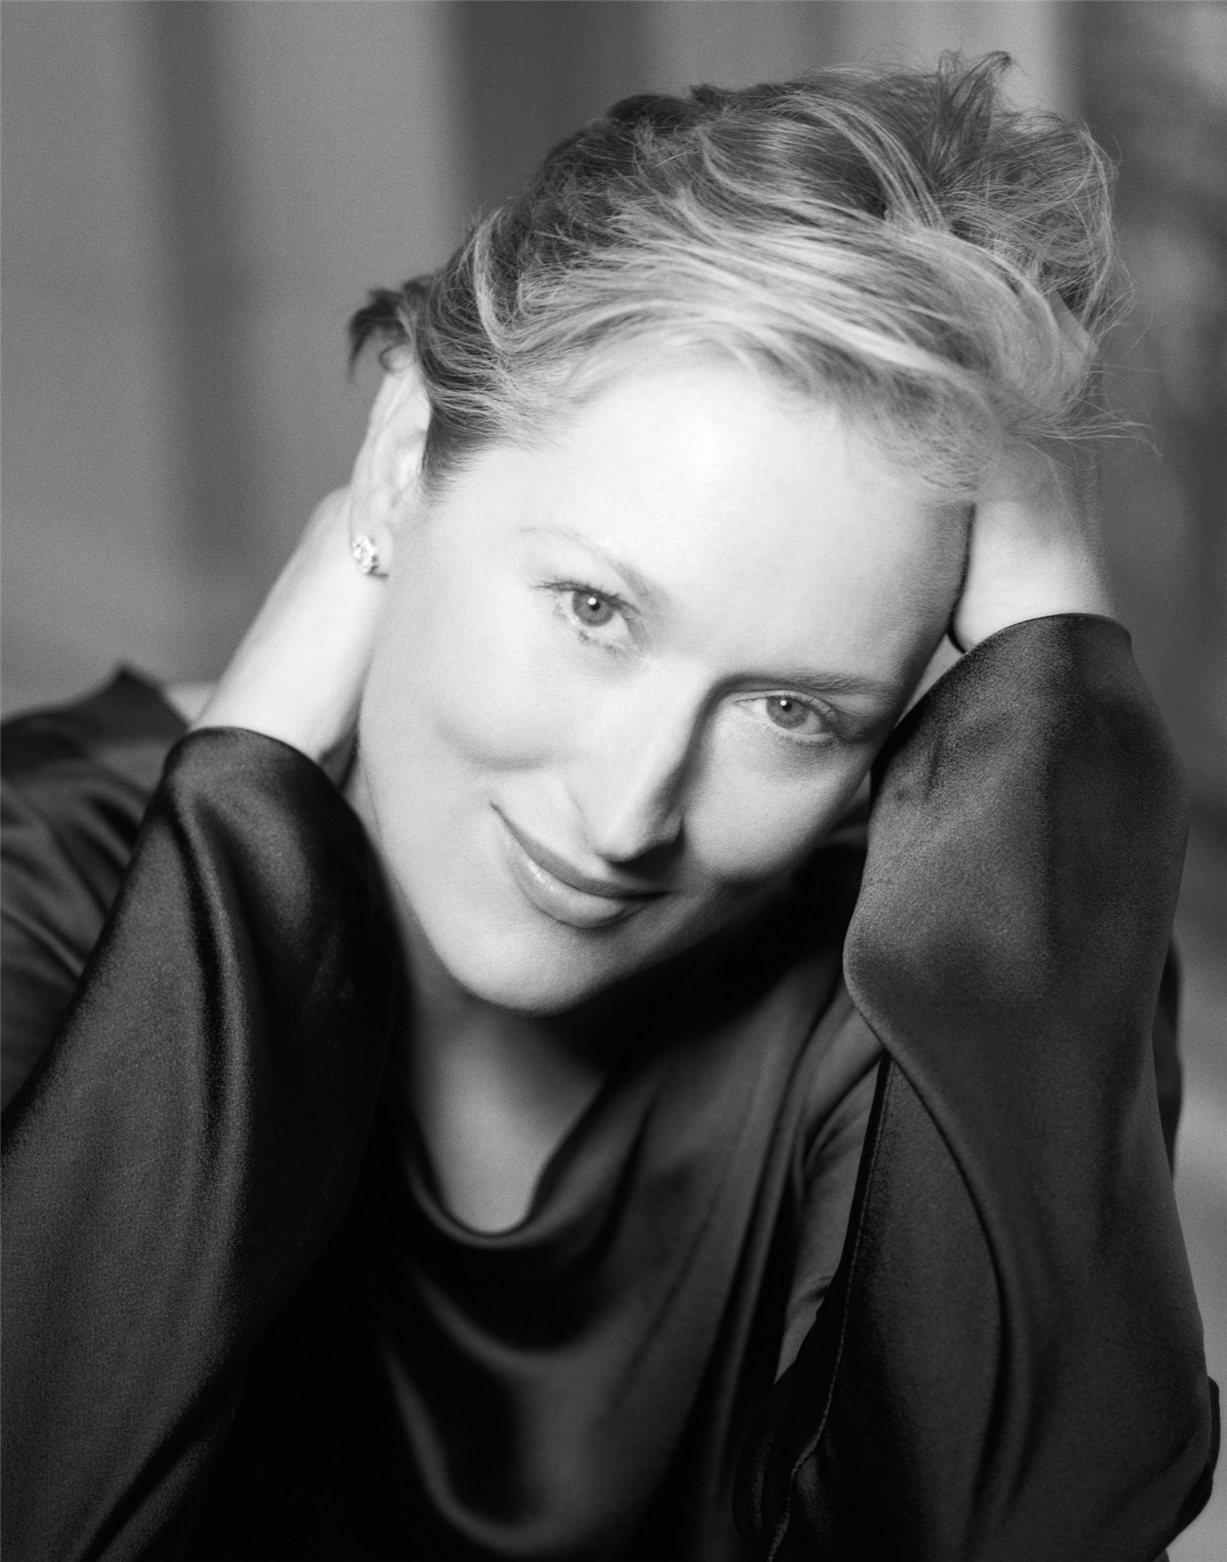 Meryl Streep / Мерил Стрип - звезды Голливуда, фотограф Firooz Zahedi